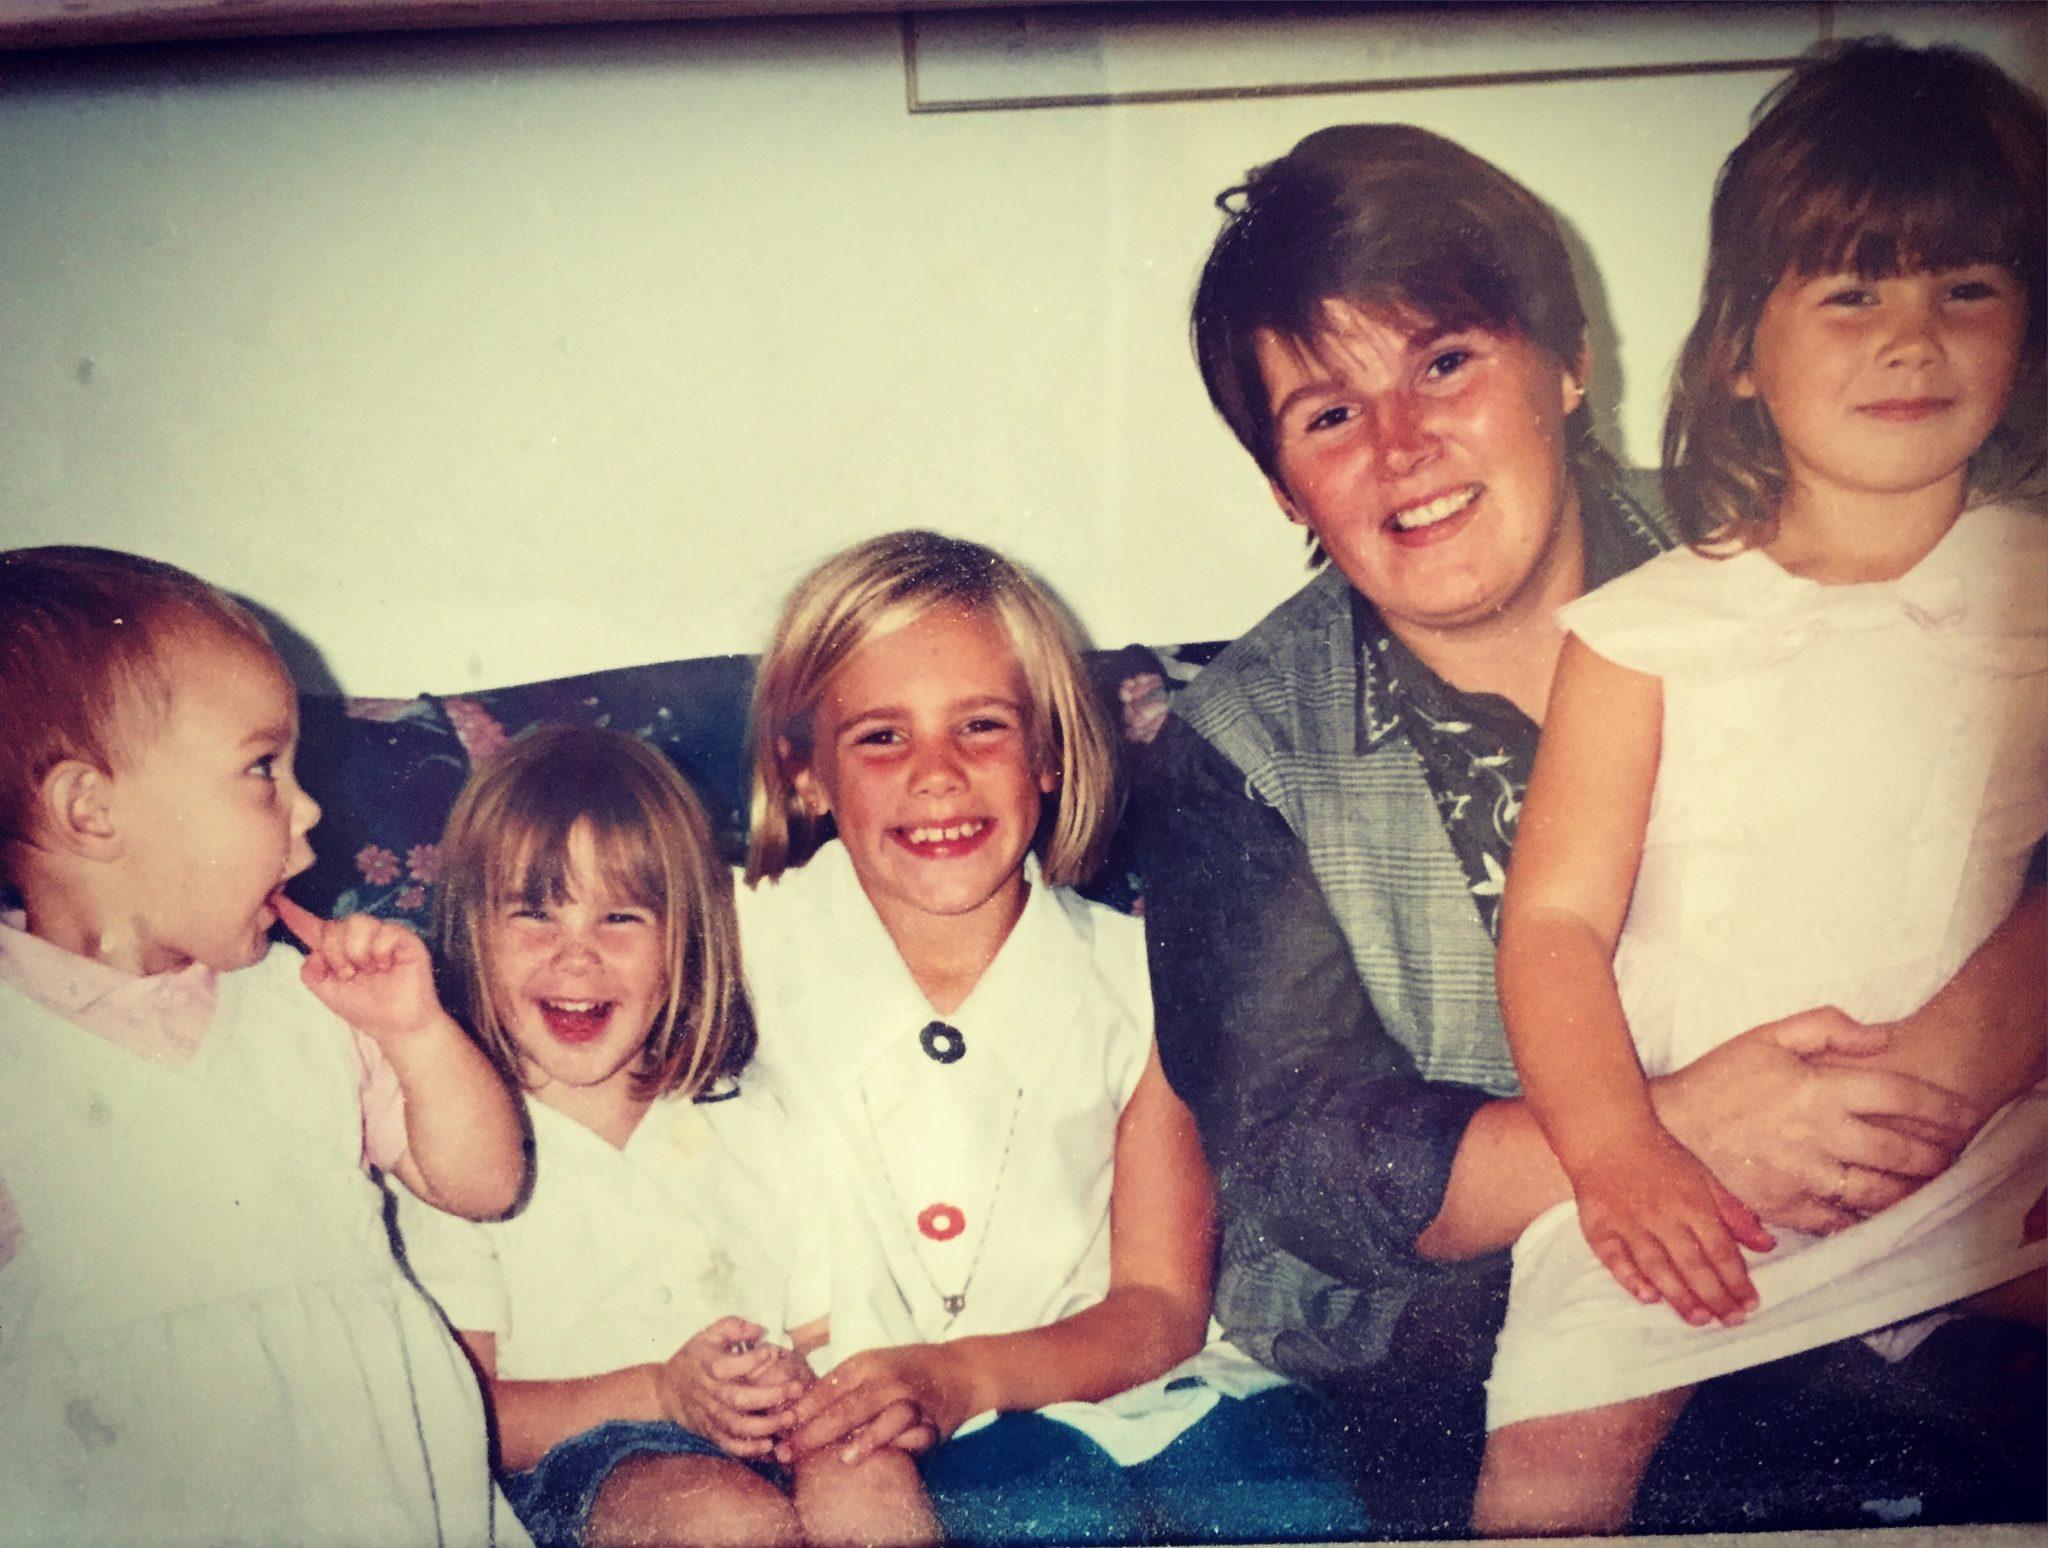 Nicola and family